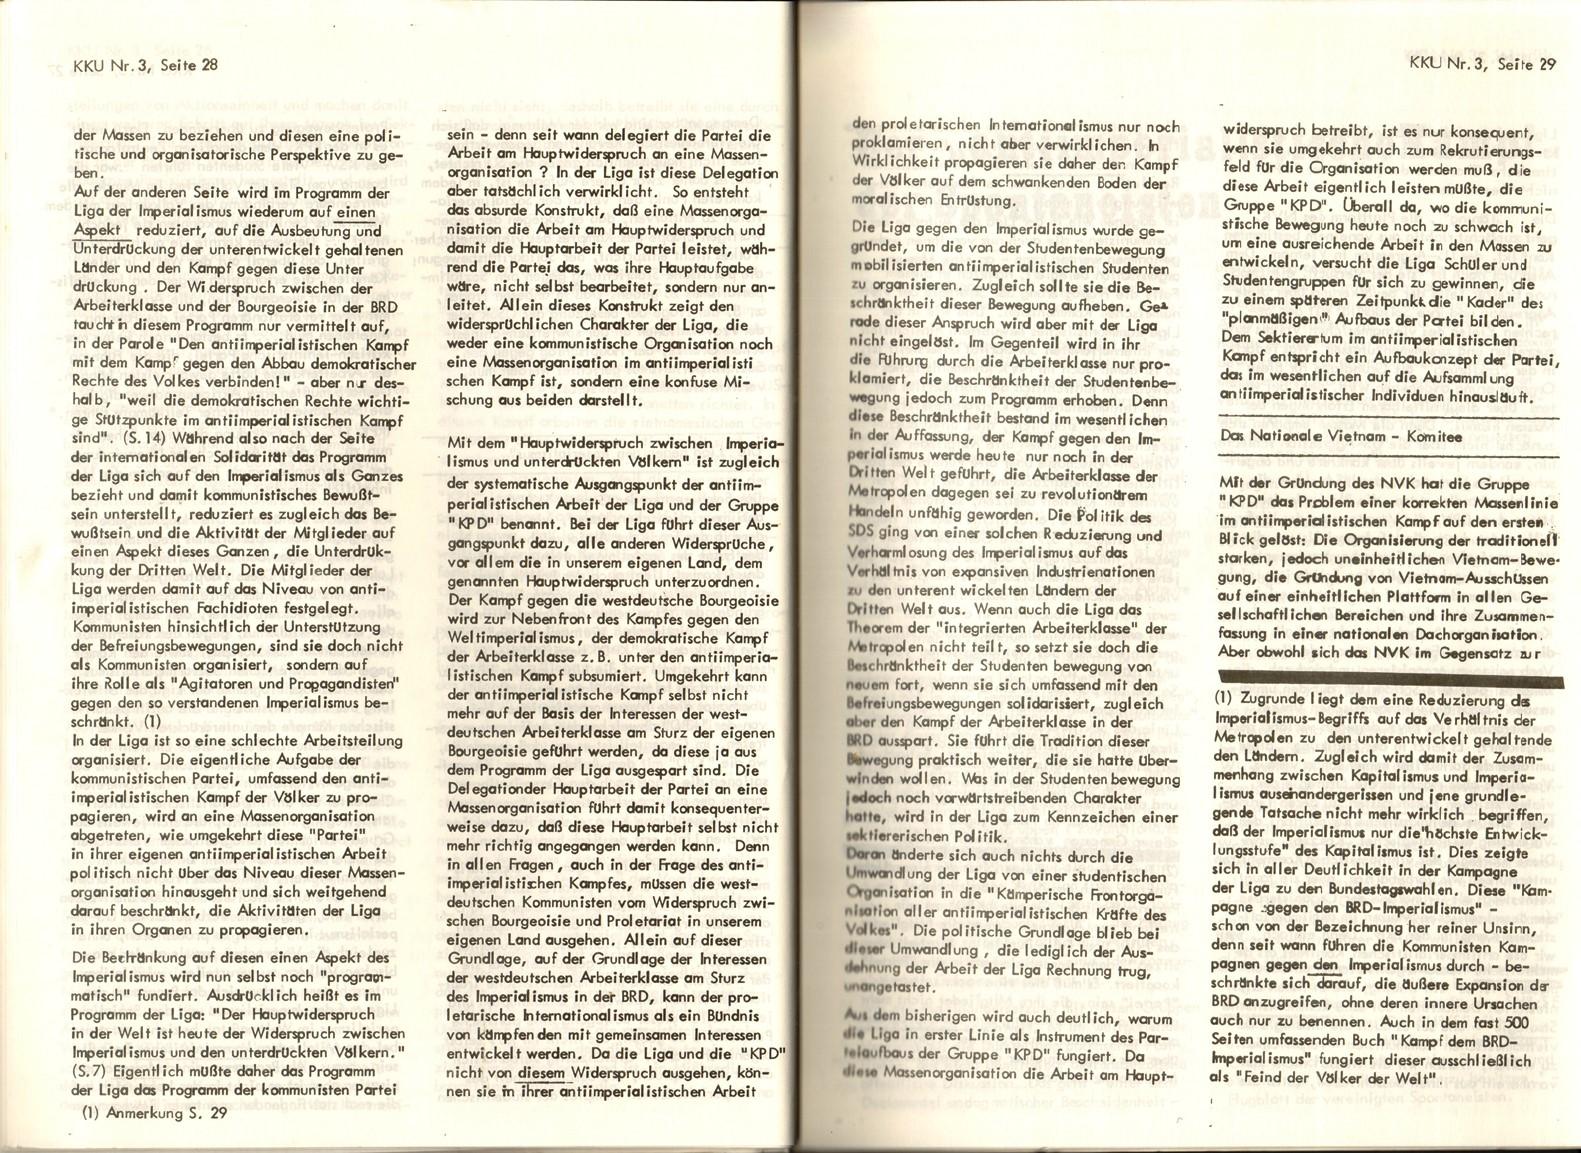 Frankfurt_Offenbach_KG_Kampf_Kritik_Umgestaltung_1973_03_16